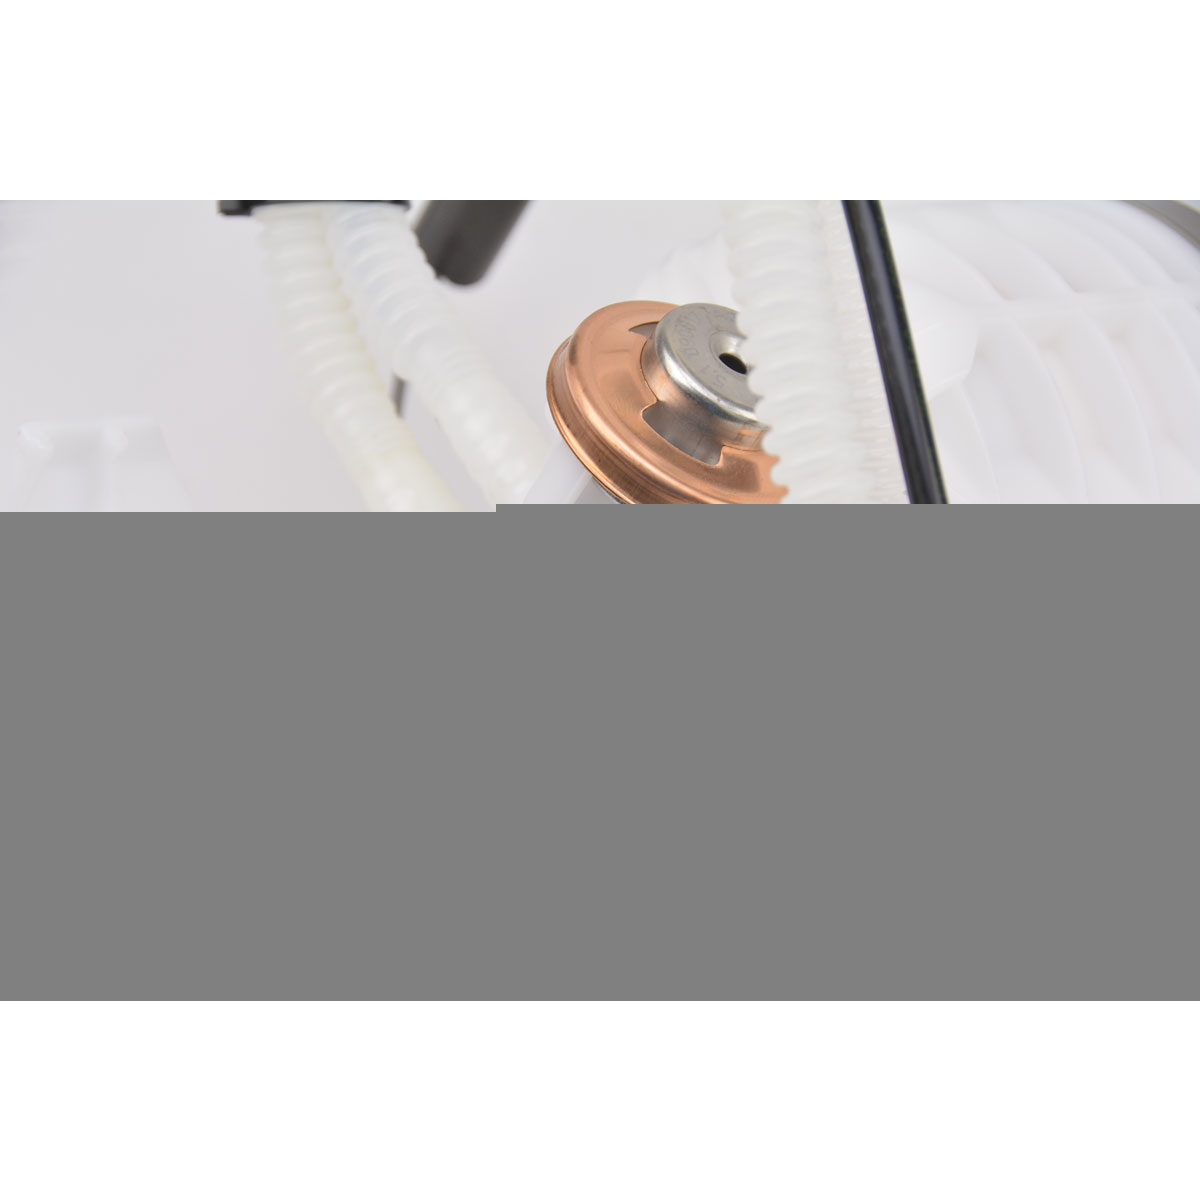 16112755084 mini cooper fuel filter w fuel level sensor right mini cooper accessories mini. Black Bedroom Furniture Sets. Home Design Ideas